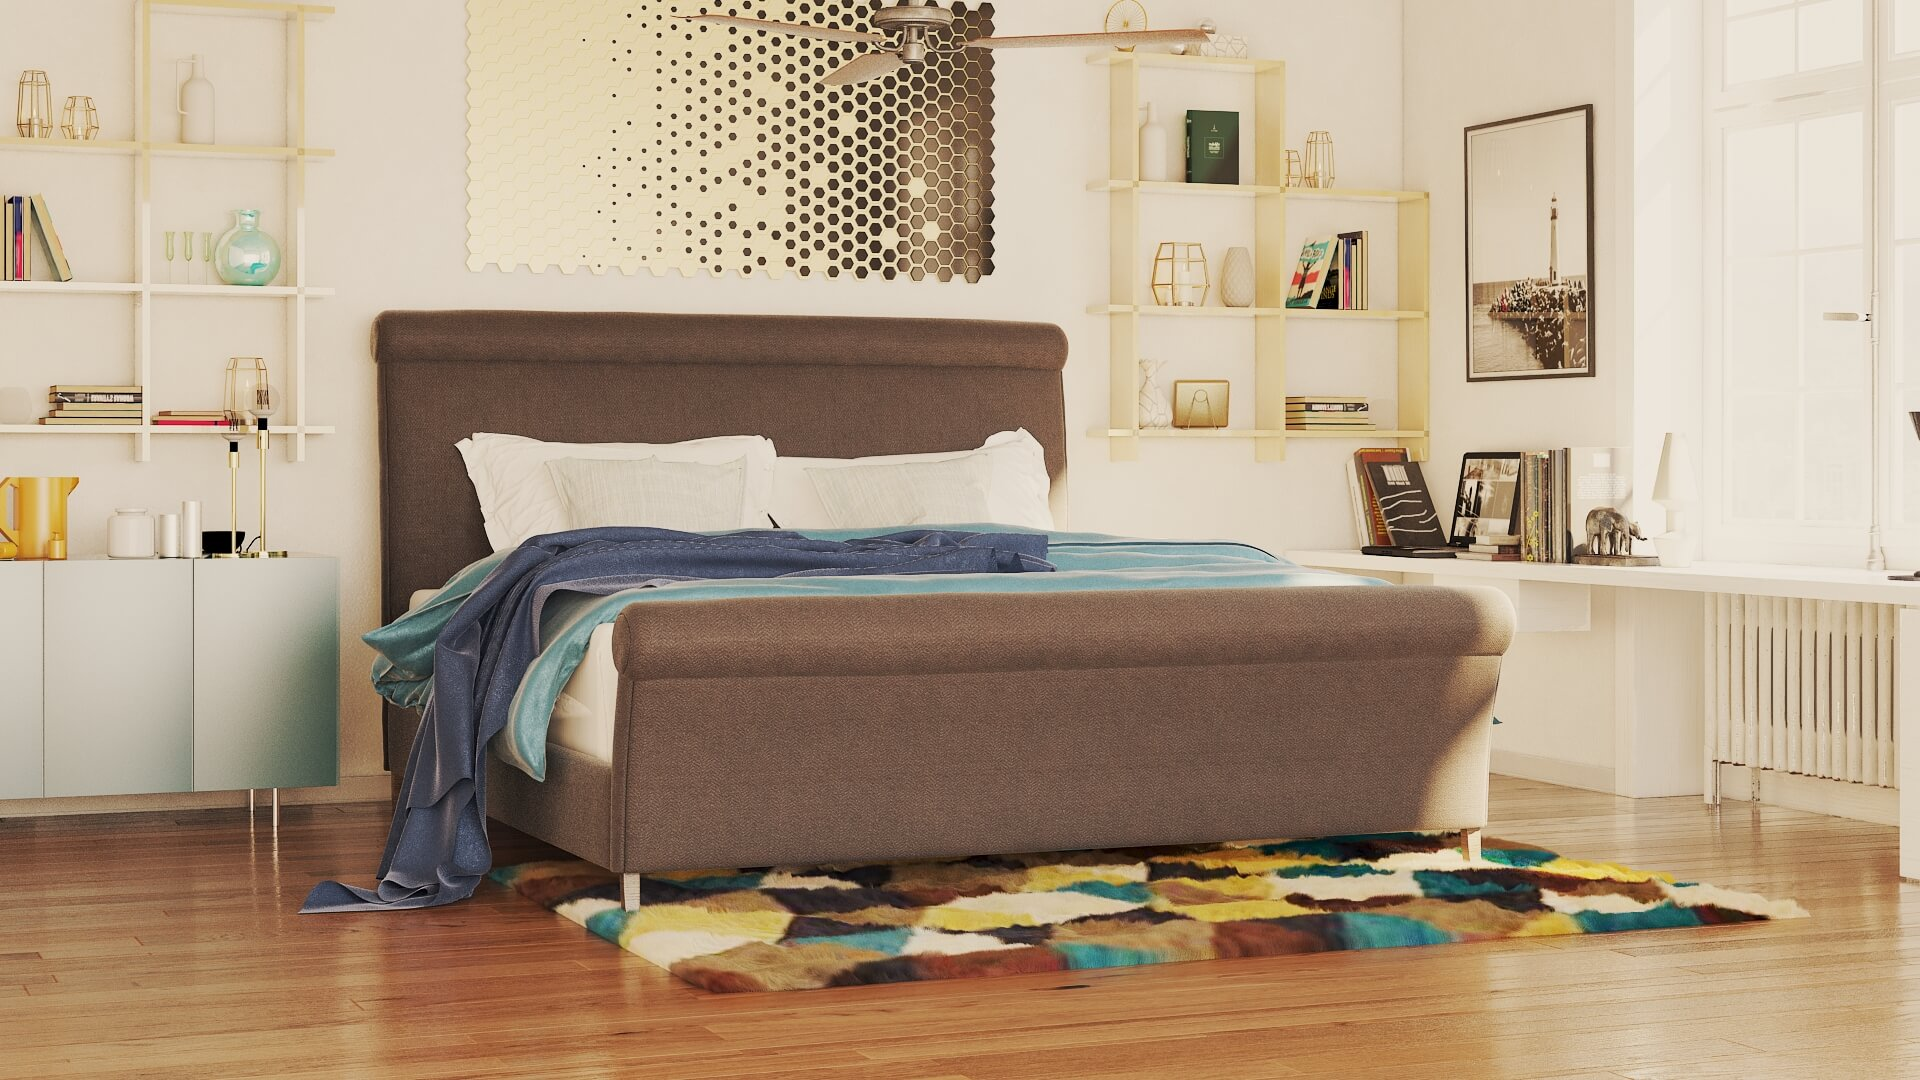 maja bed furniture gallery 3